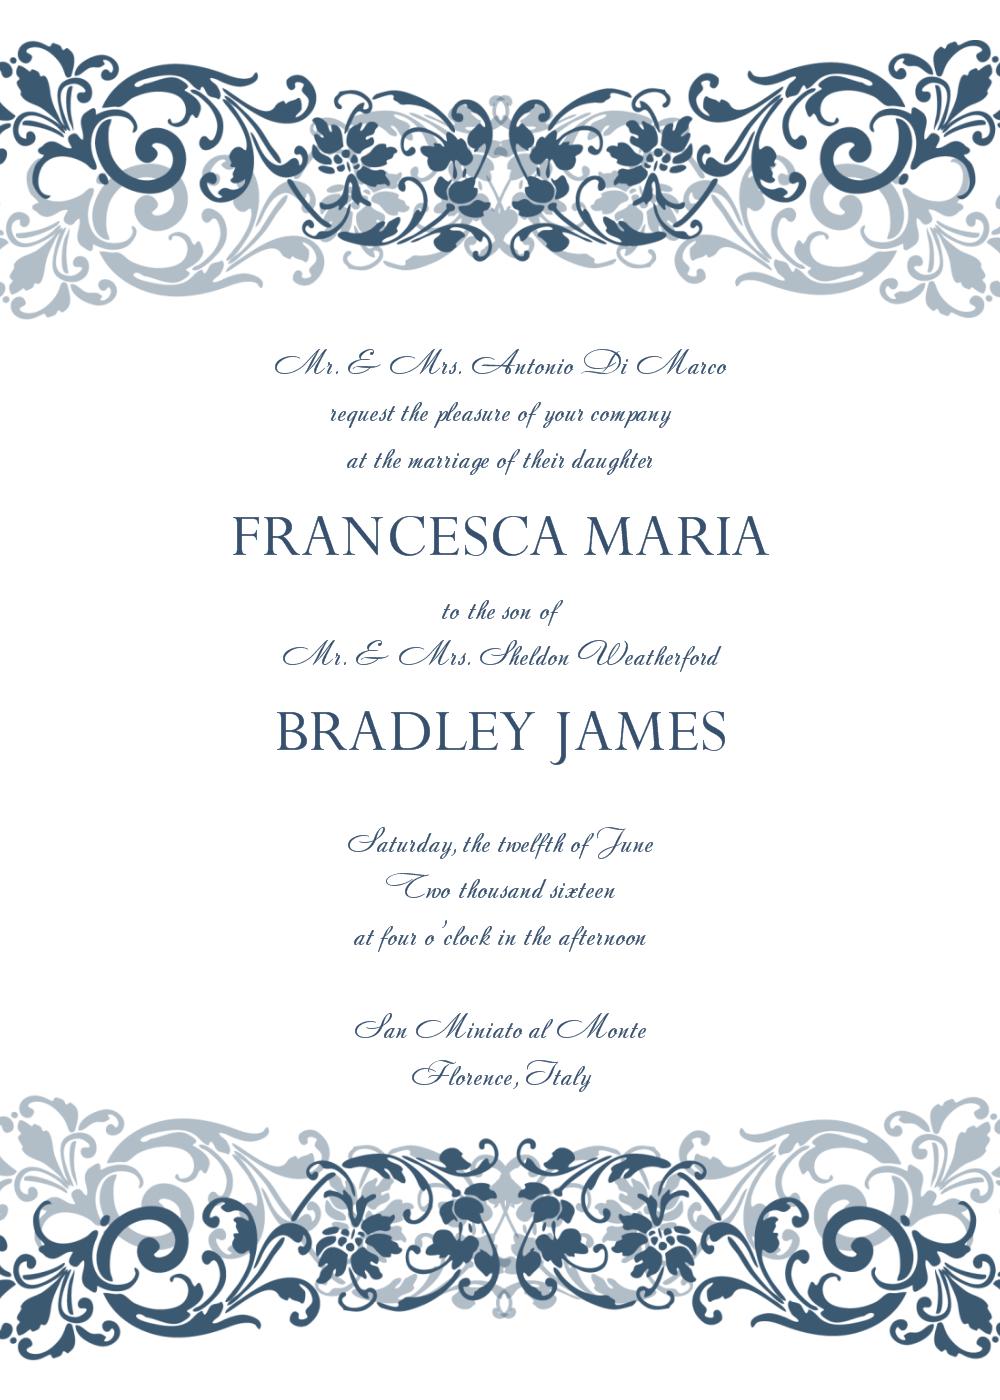 30+ Free Wedding Invitations Templates   21St - Bridal World - Free Printable Wedding Scrolls